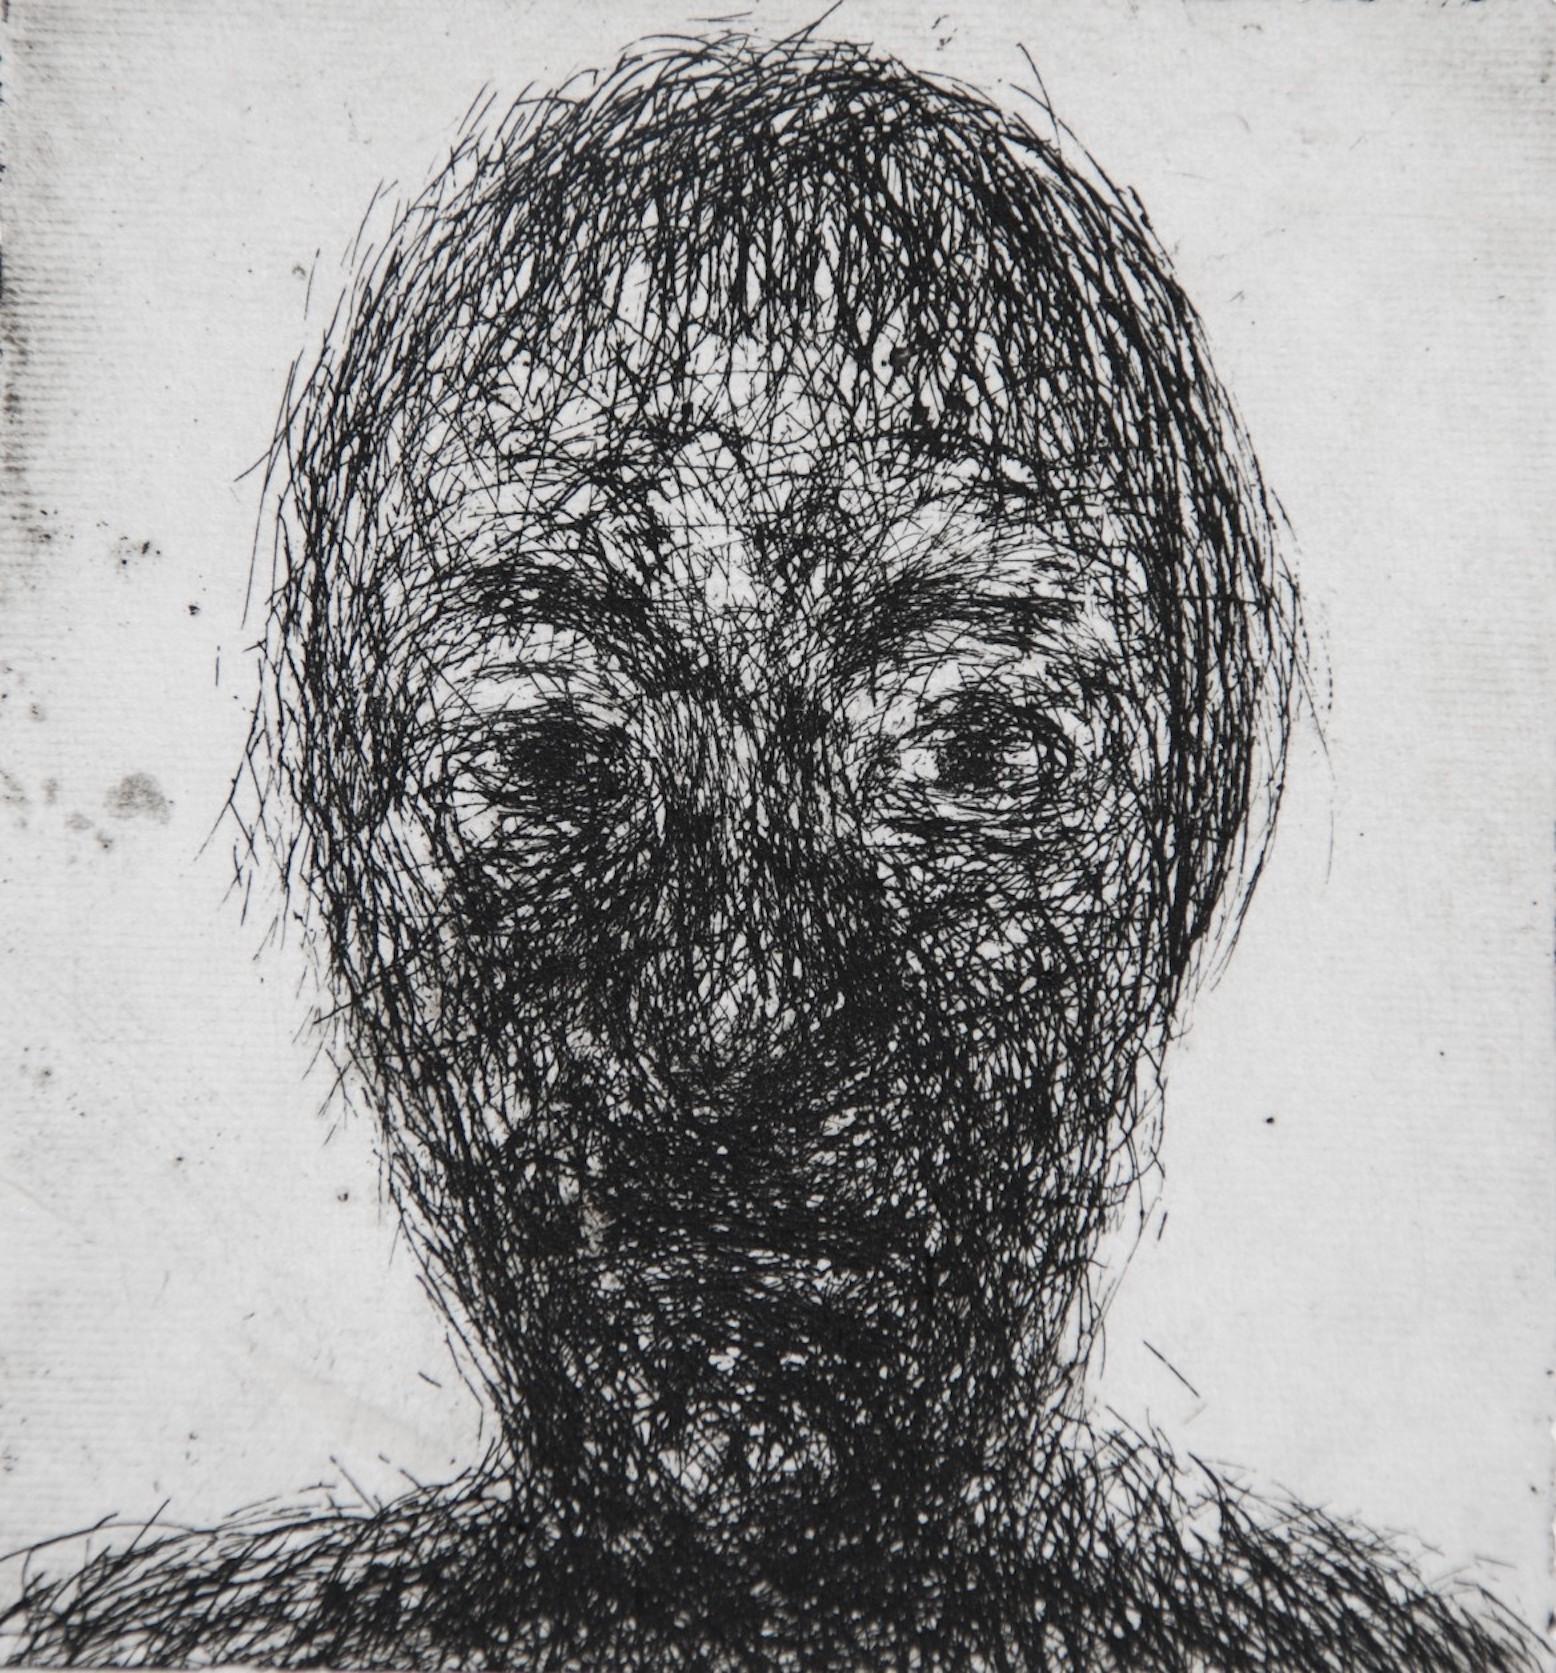 Mood 27, multi-states etching, 9 x 8 cm